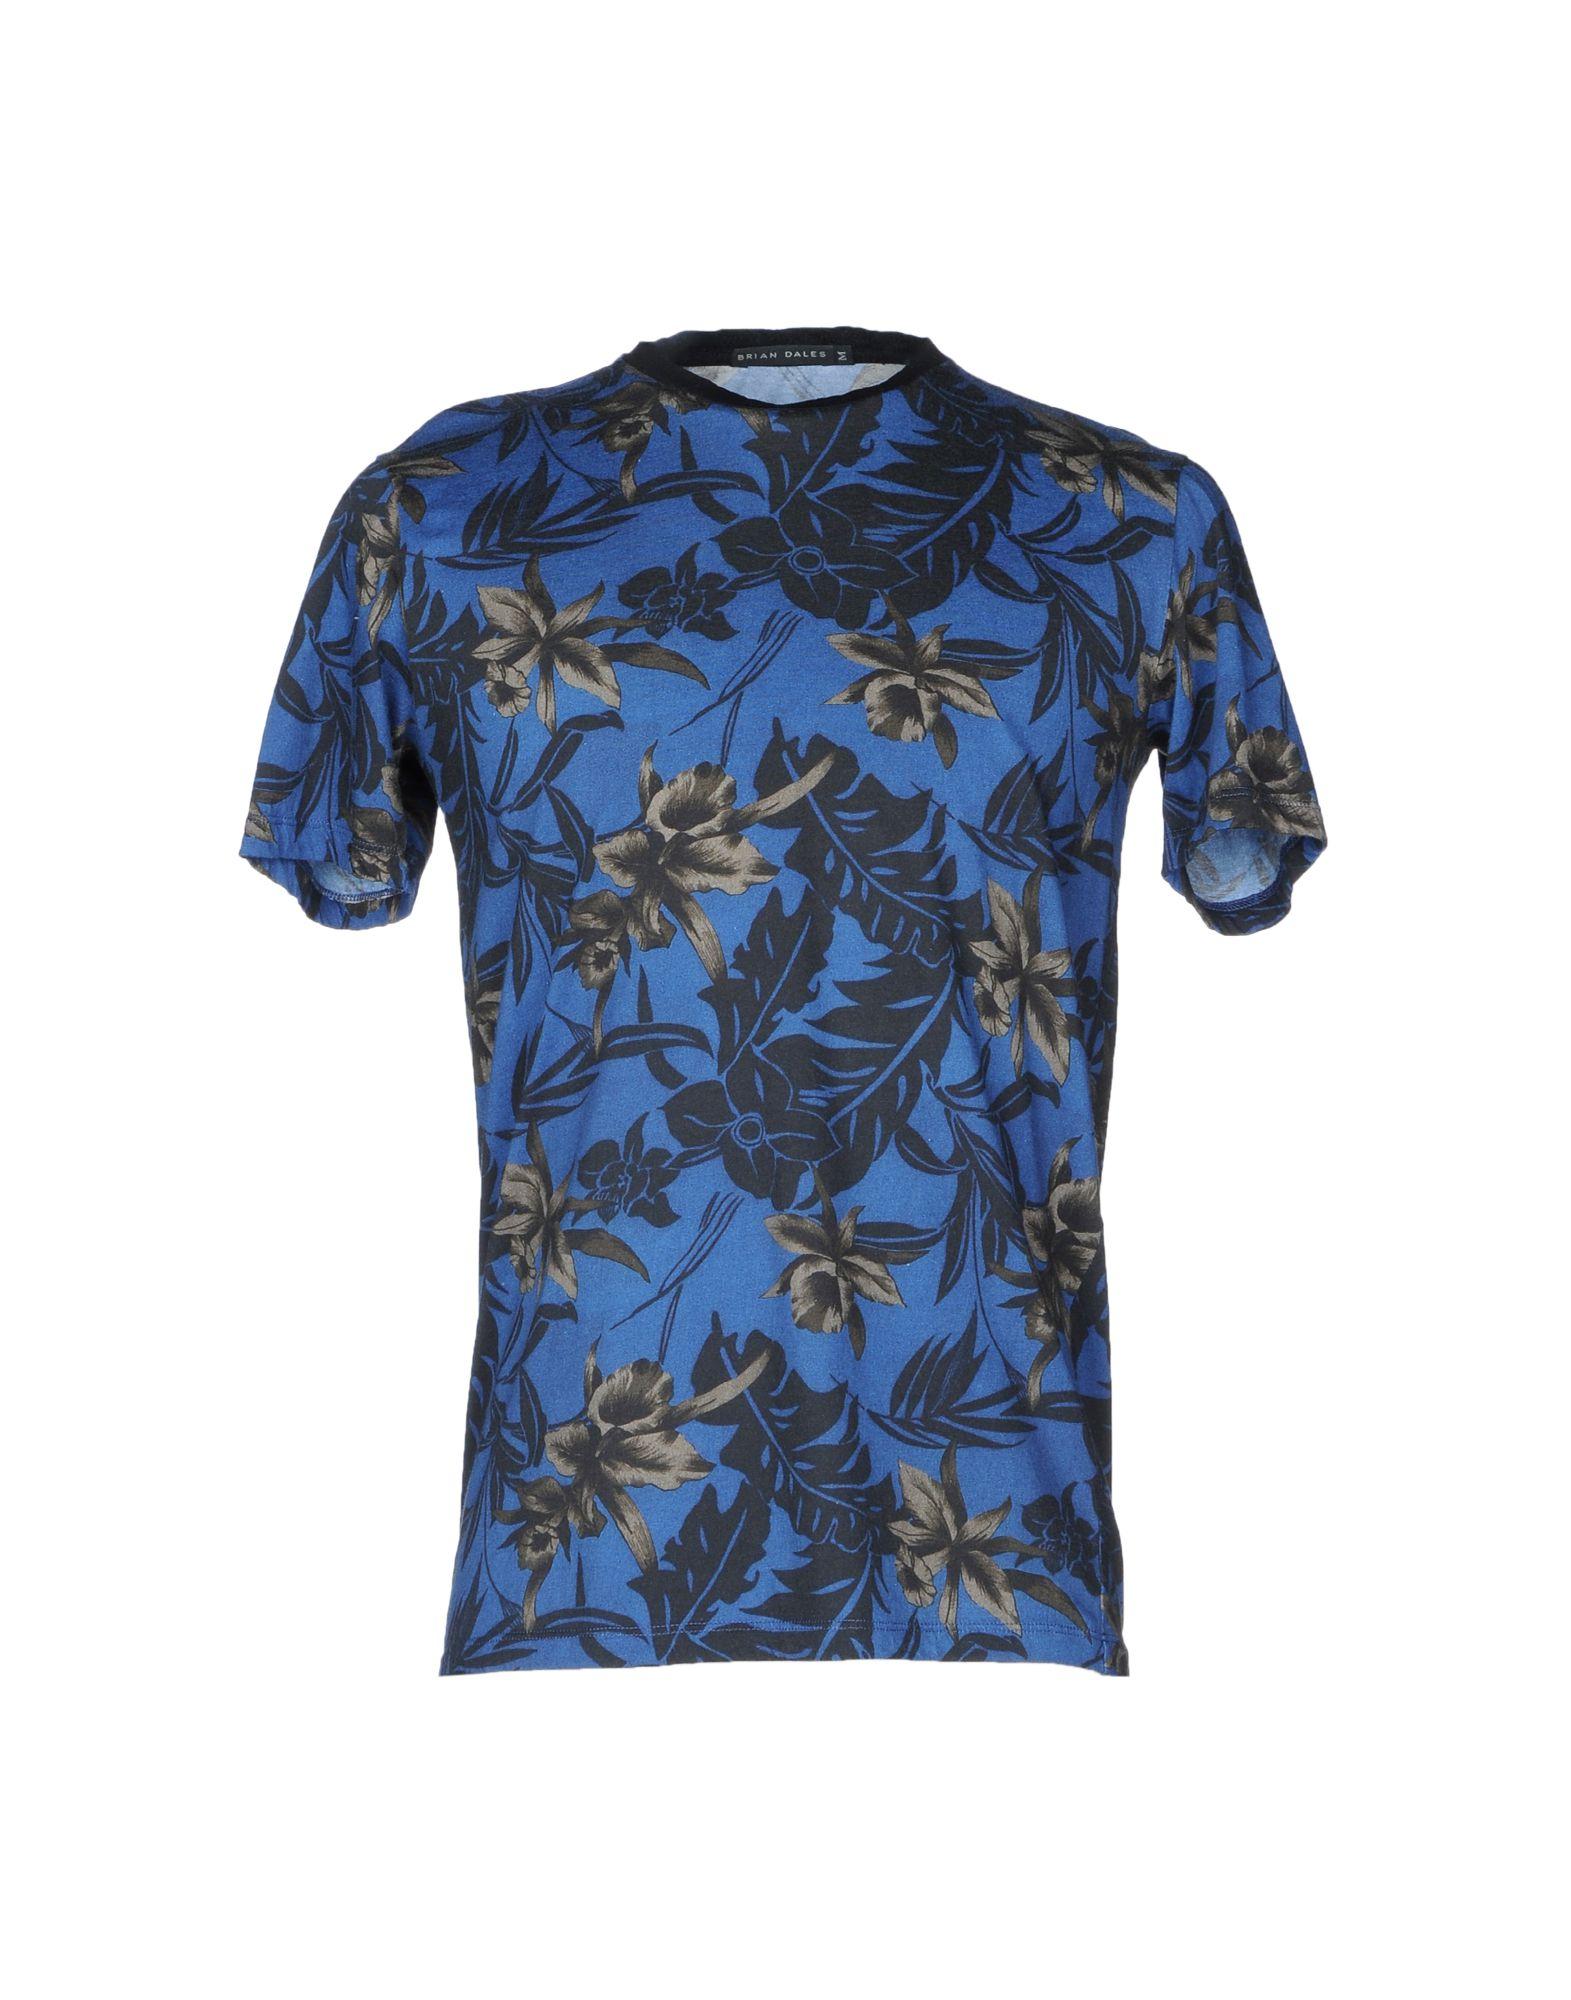 T-Shirt Brian Dales Uomo - Acquista online su